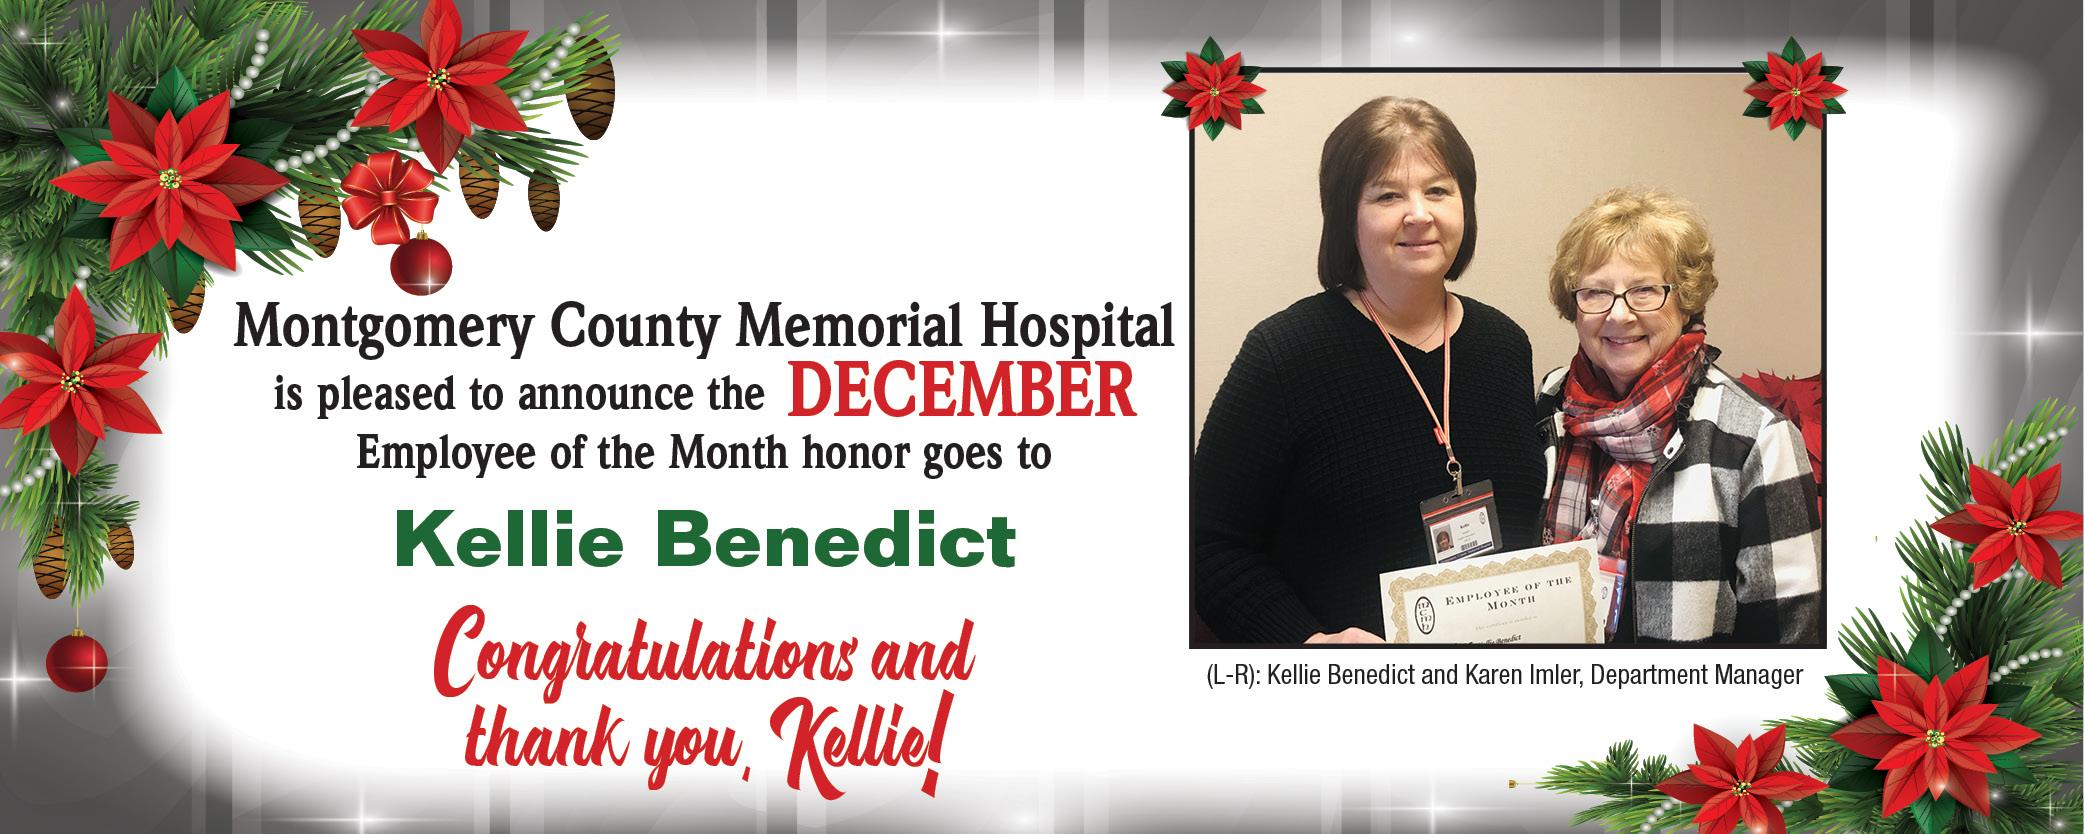 December Employee of the Month, Kellie Benedict.